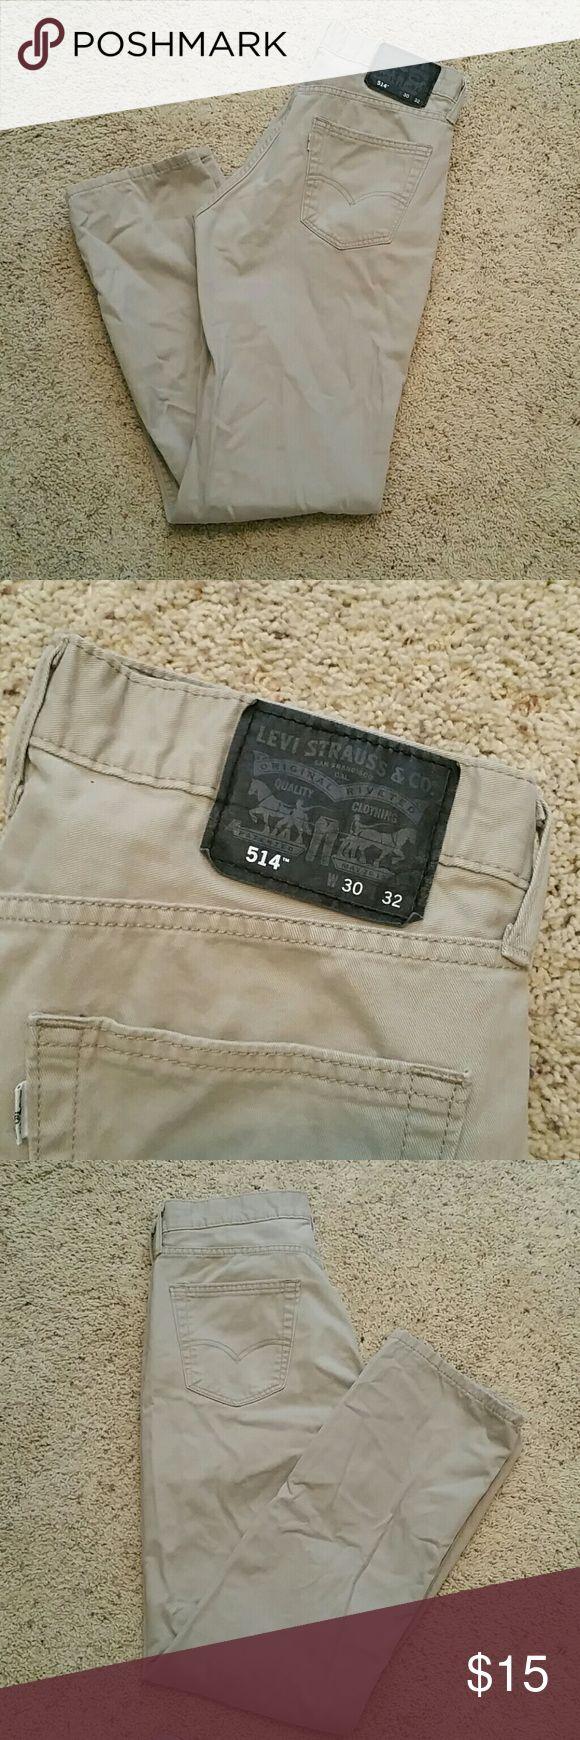 Men's Levi's 514 khaki jeans Men's Levi's 514 khaki jeans barely worn, light weight fabric Levi's Jeans Straight